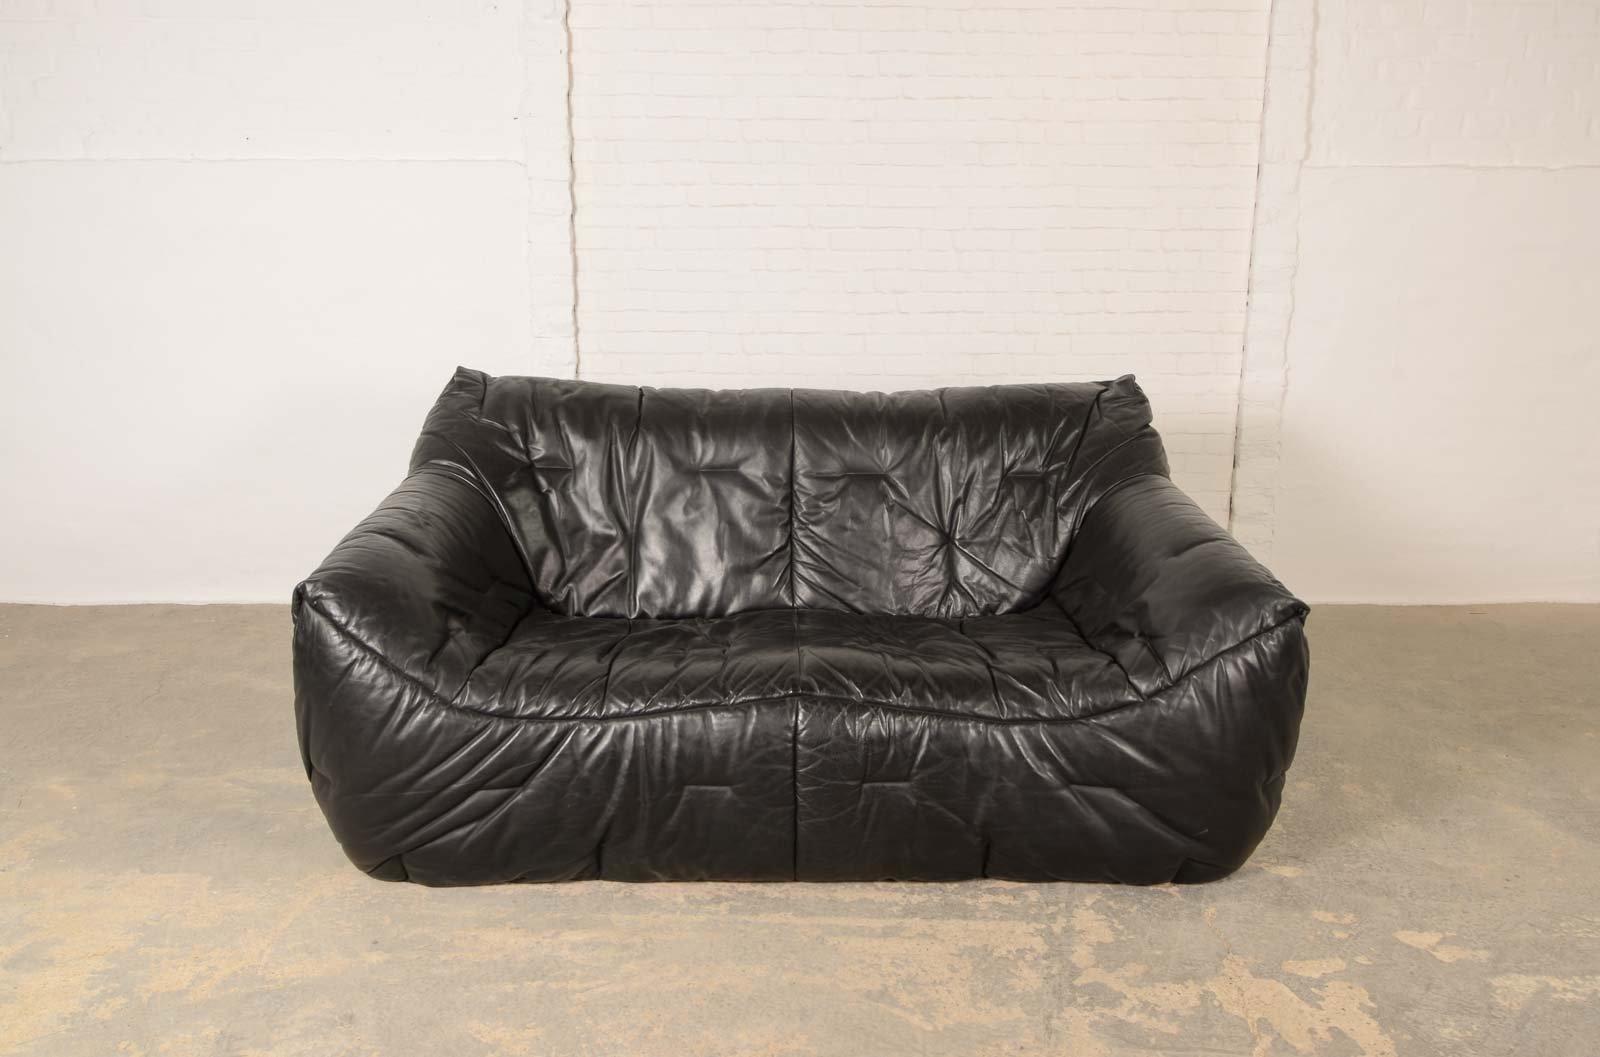 Vintage Black Leather Soft Shell Sofa By Hans Hopfer For Roche Bobois